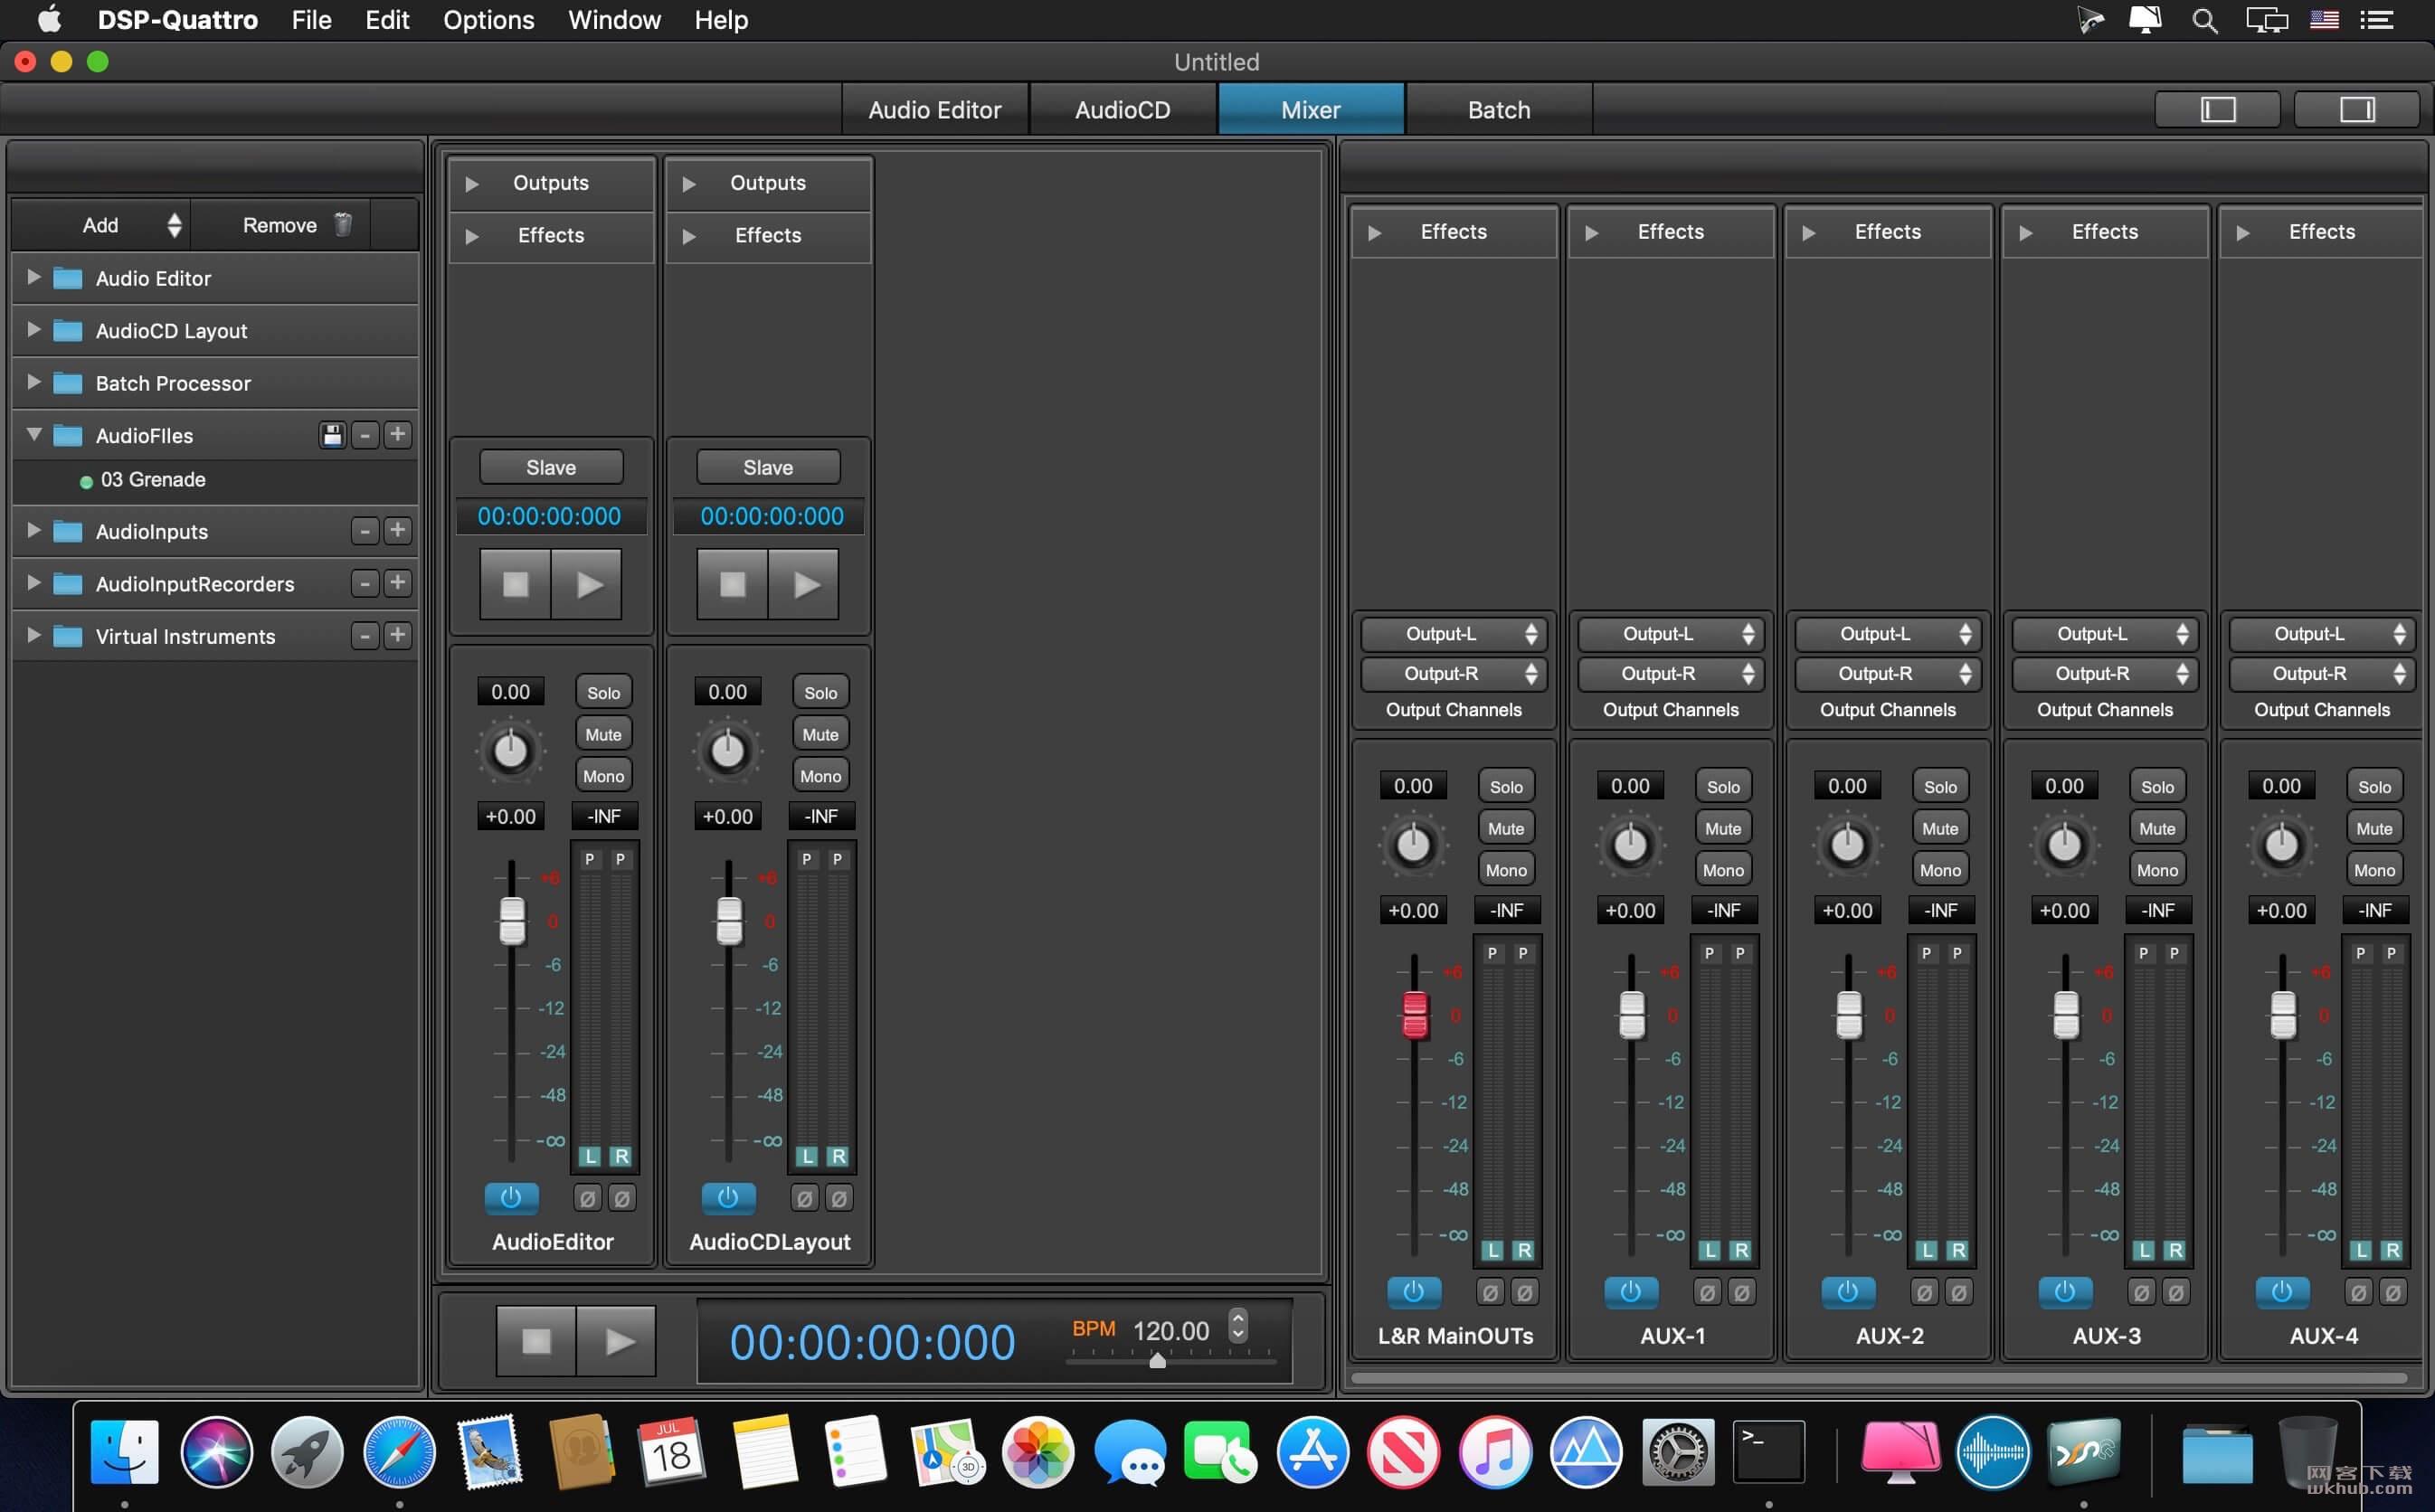 DSP-Quattro 5.2.1 音频编辑工具